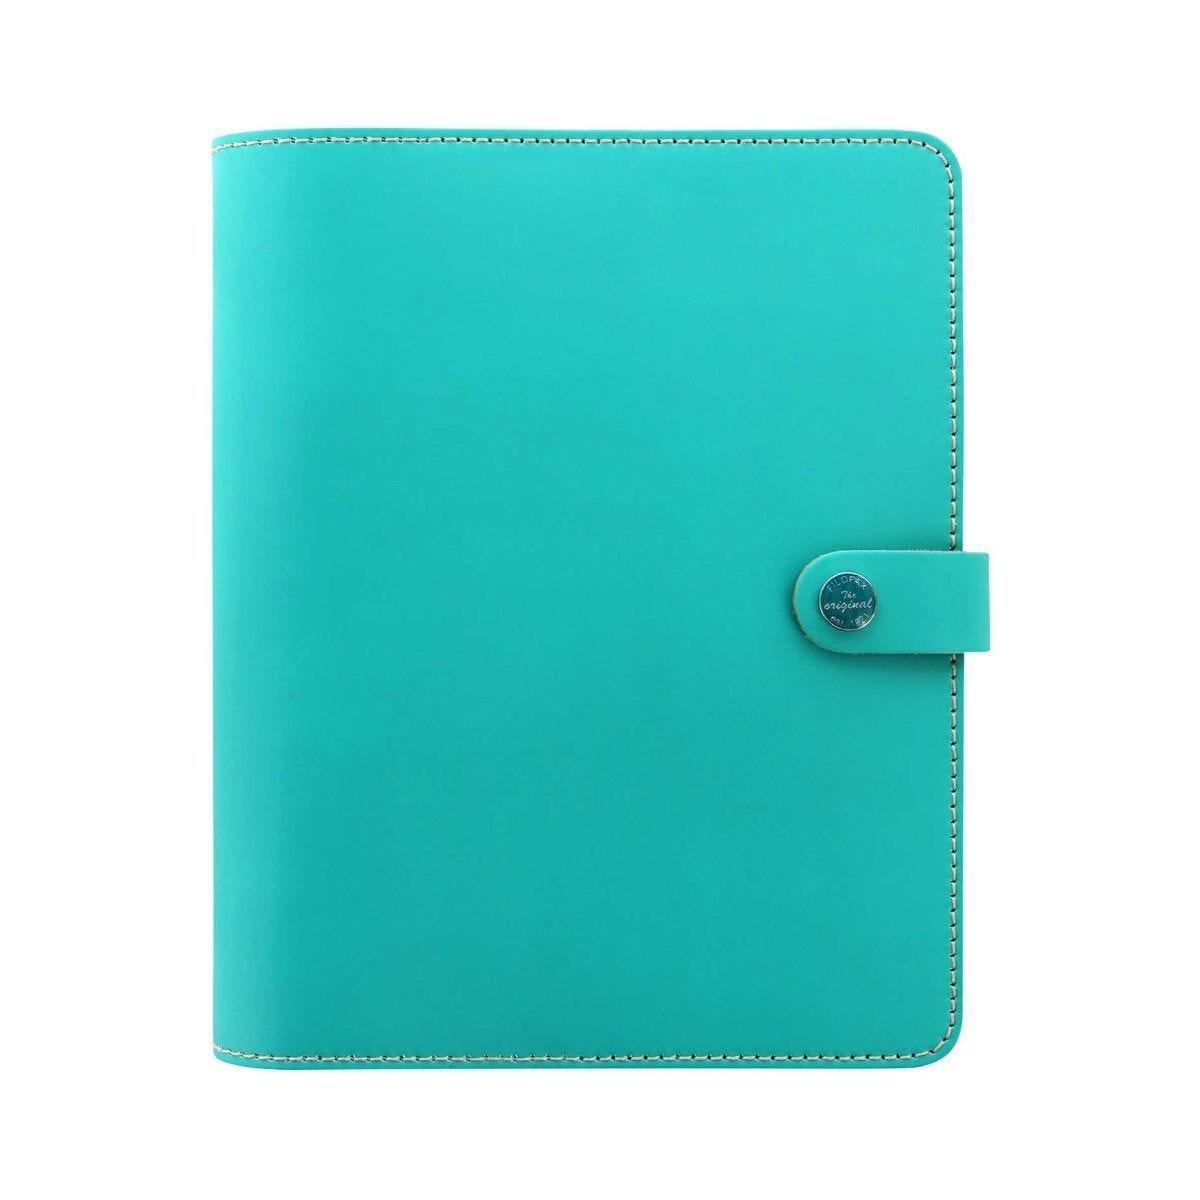 Filofax A5 Organiser The Original Turquoise